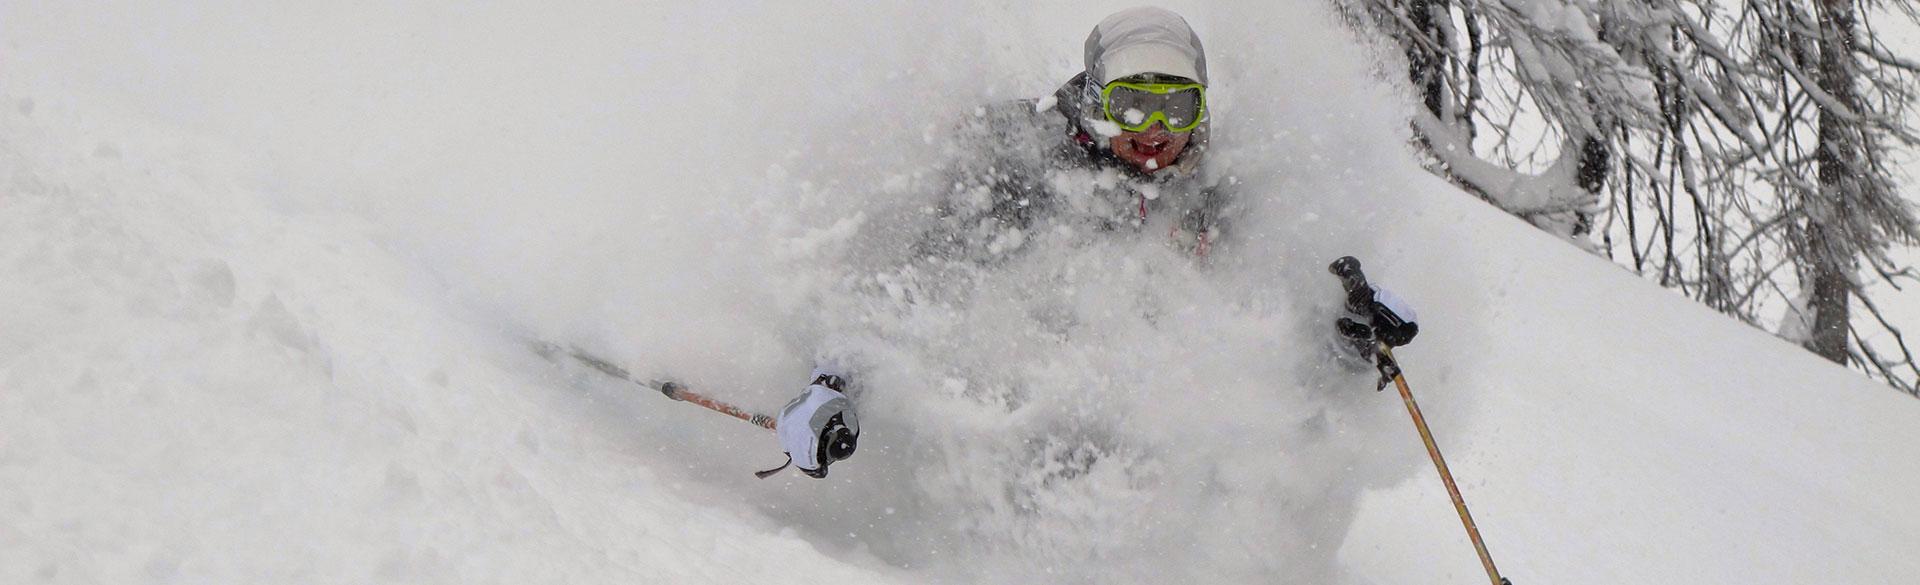 Skitourenangebote - Geniesser SME